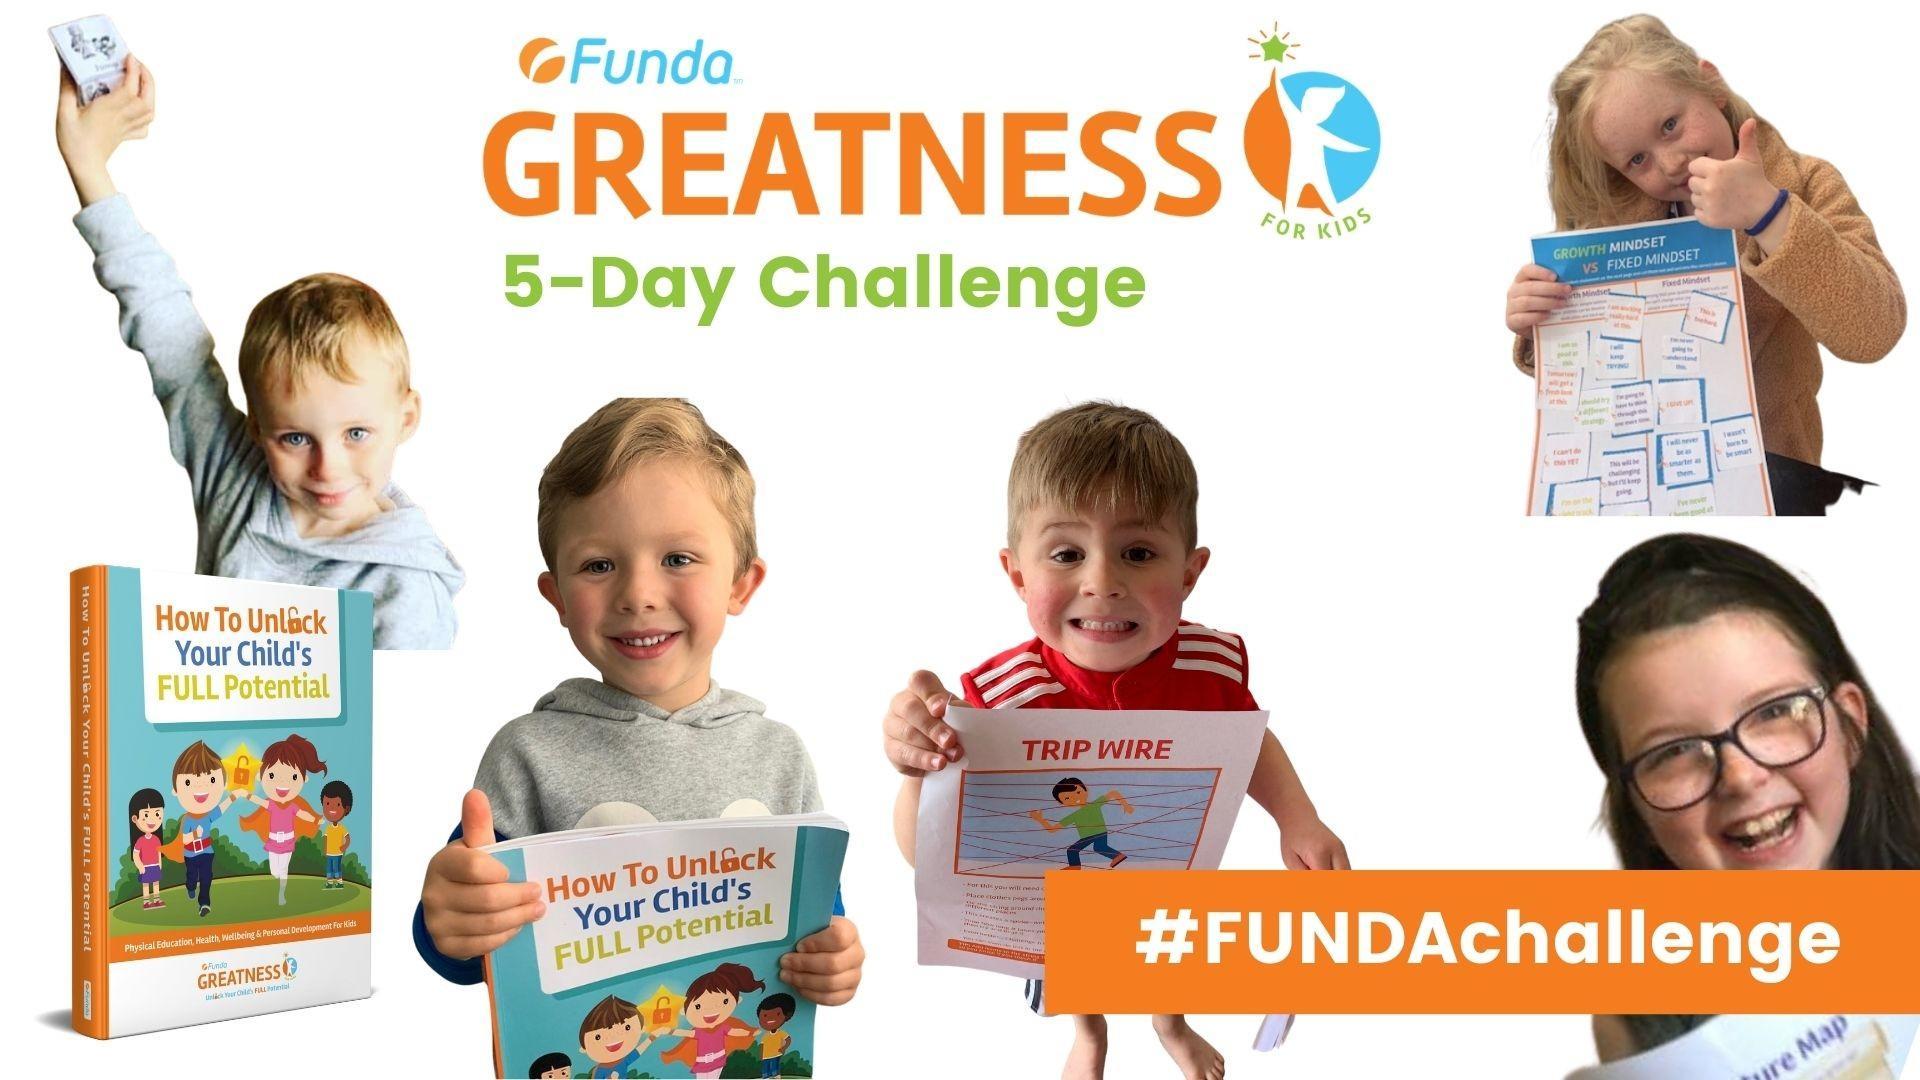 FUNDA Greatness 5-Day Challenge